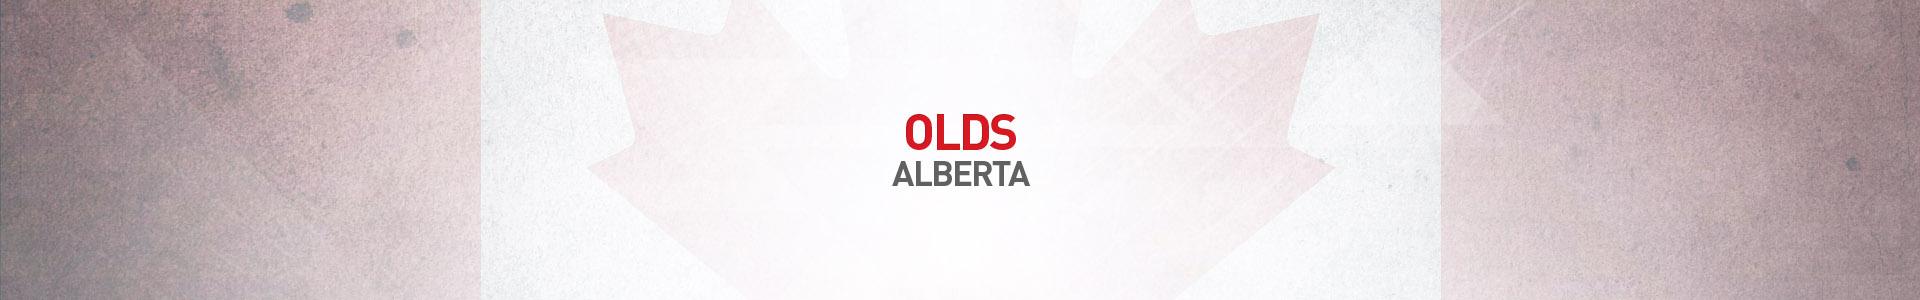 Topo-Cidades-Olds-SBA